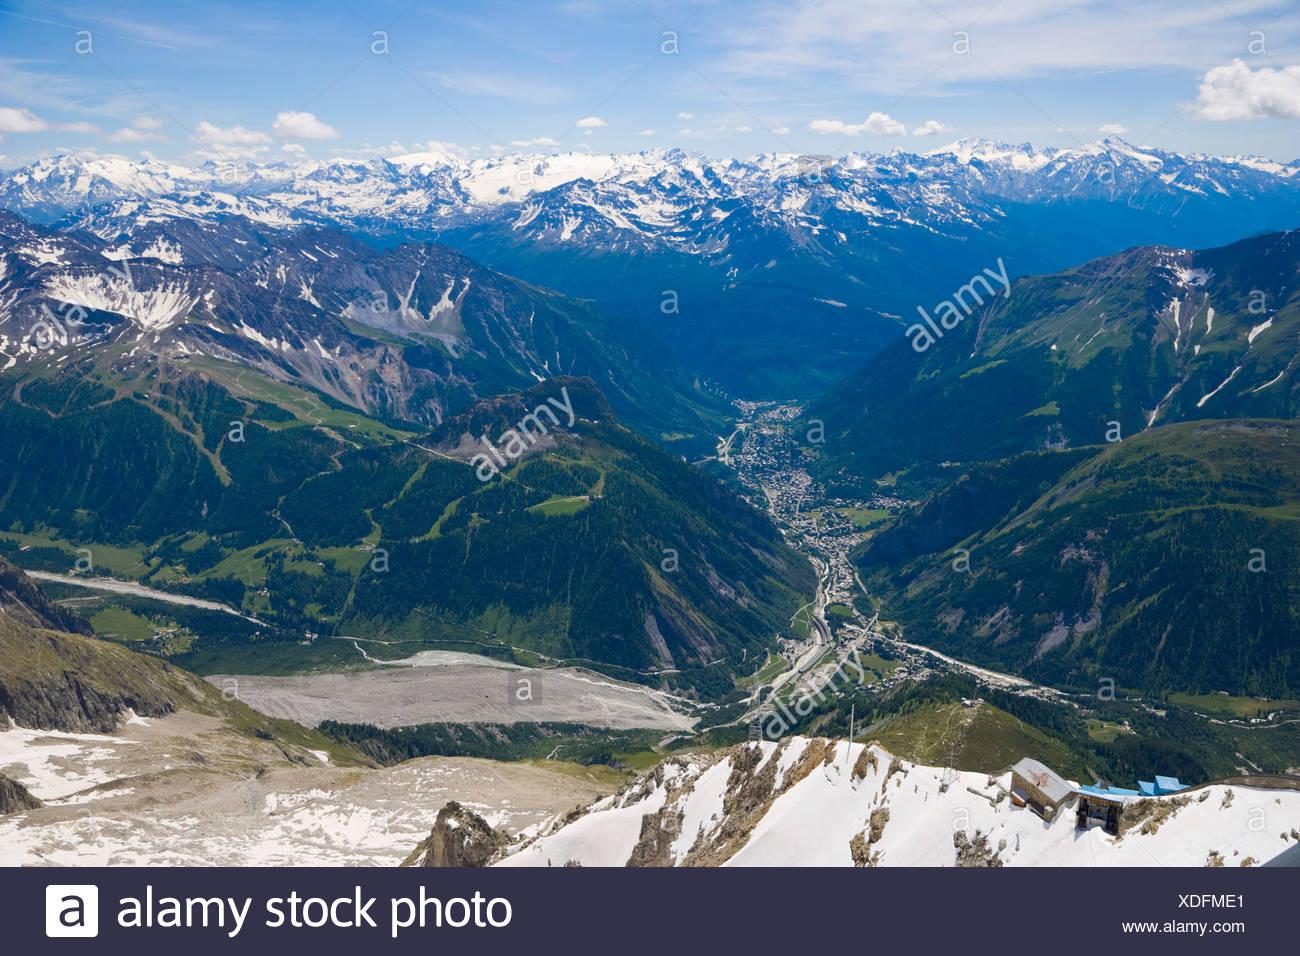 Aosta Valley, Valle d'Aosta, Val Ferret, Val Veny, Brenva Glacier from Rifugio Torino, Funivie Monte Bianco, Mont Blanc Funicul - Stock Image